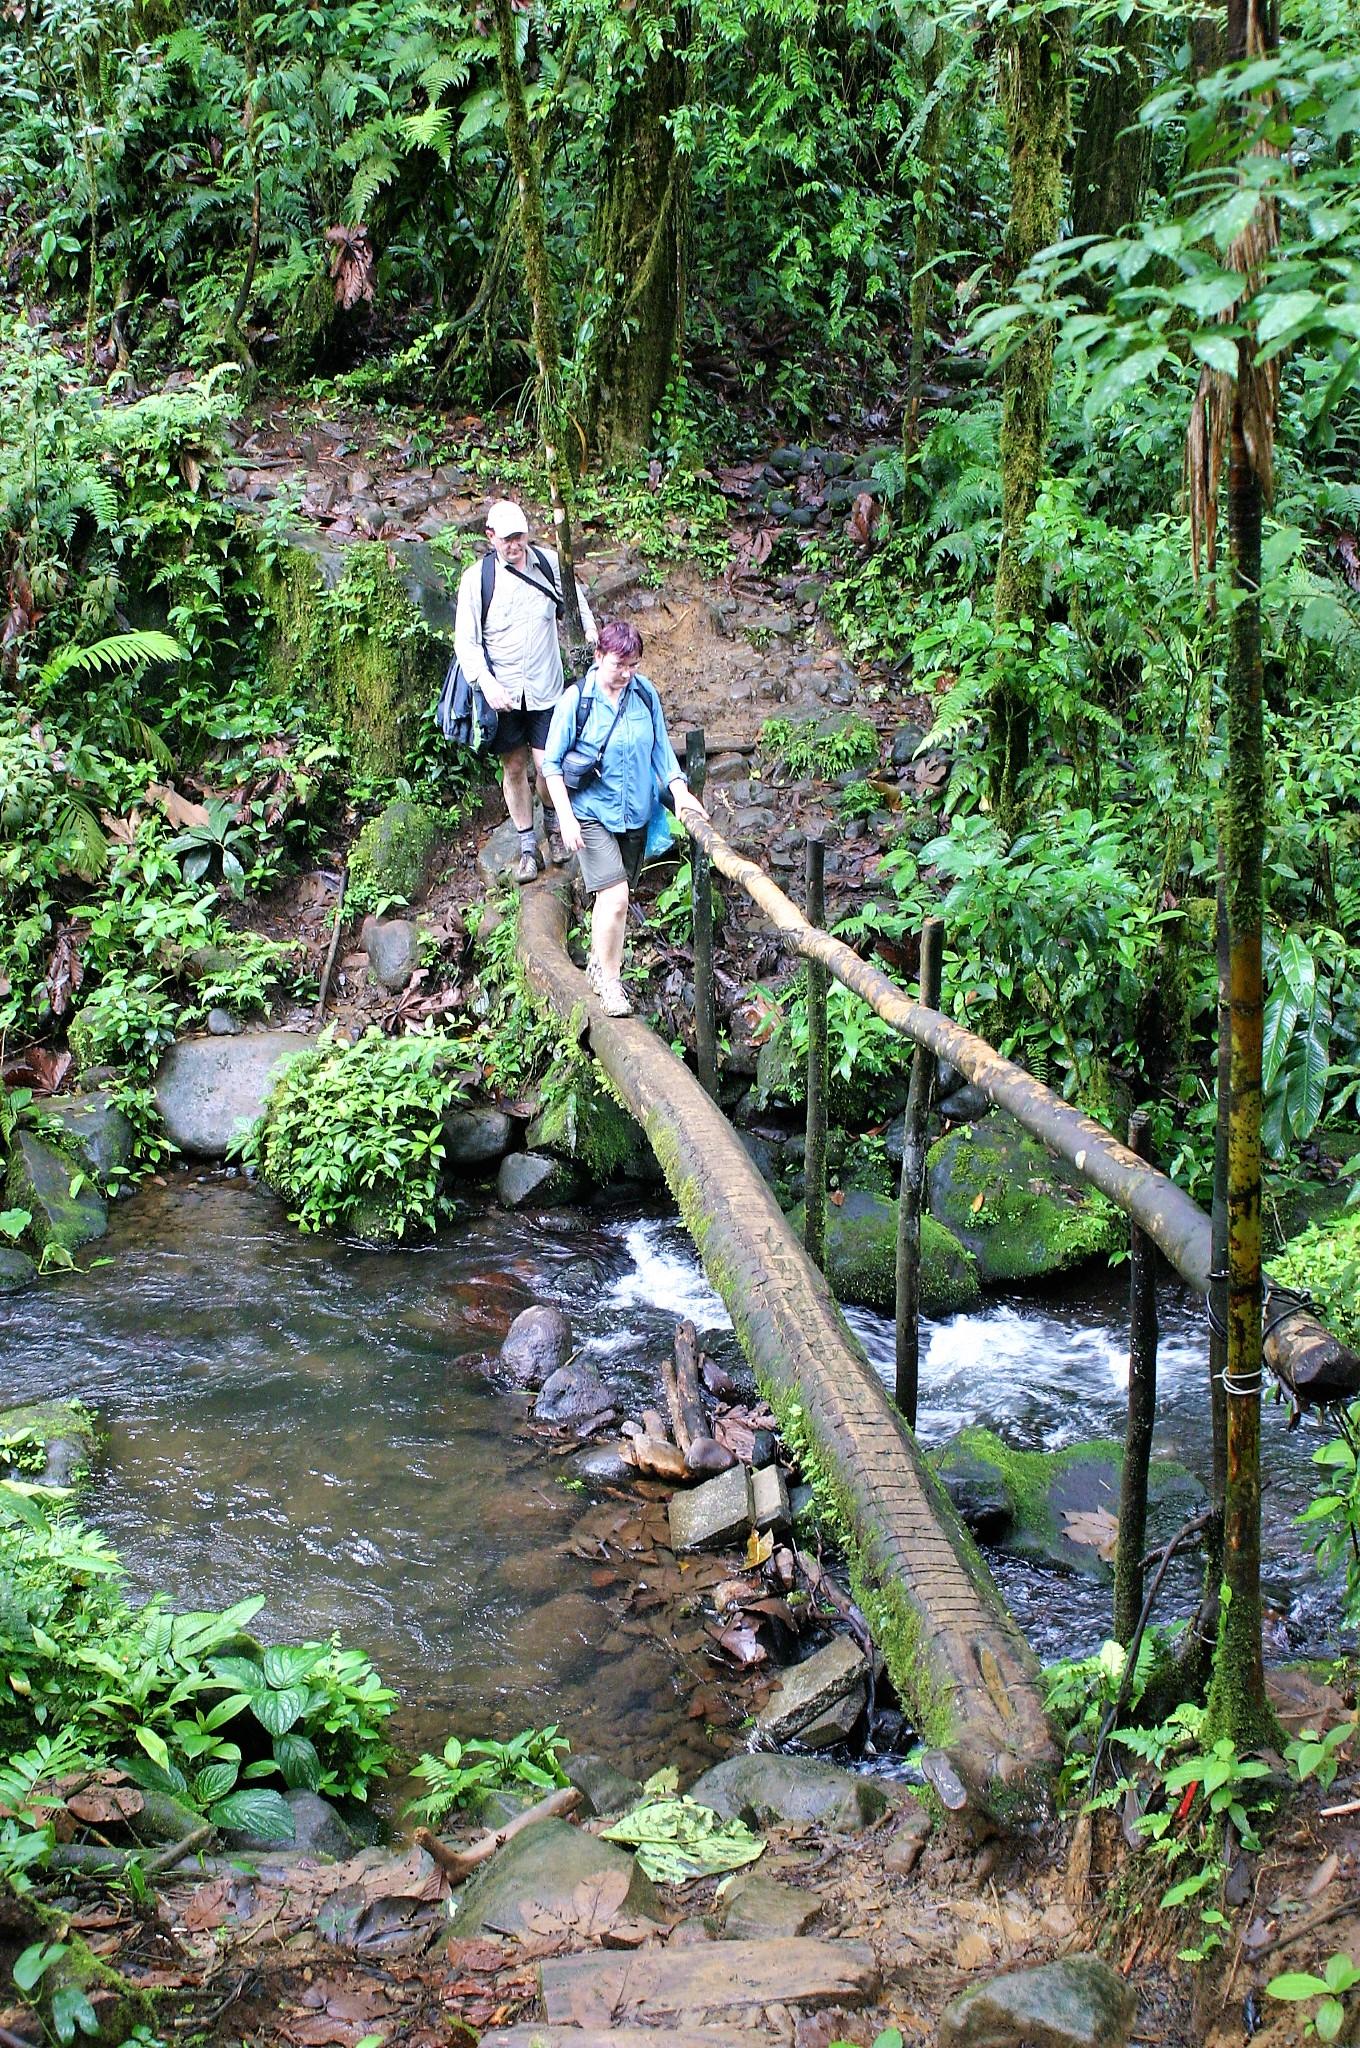 Hiking with Sentir Costa Rica